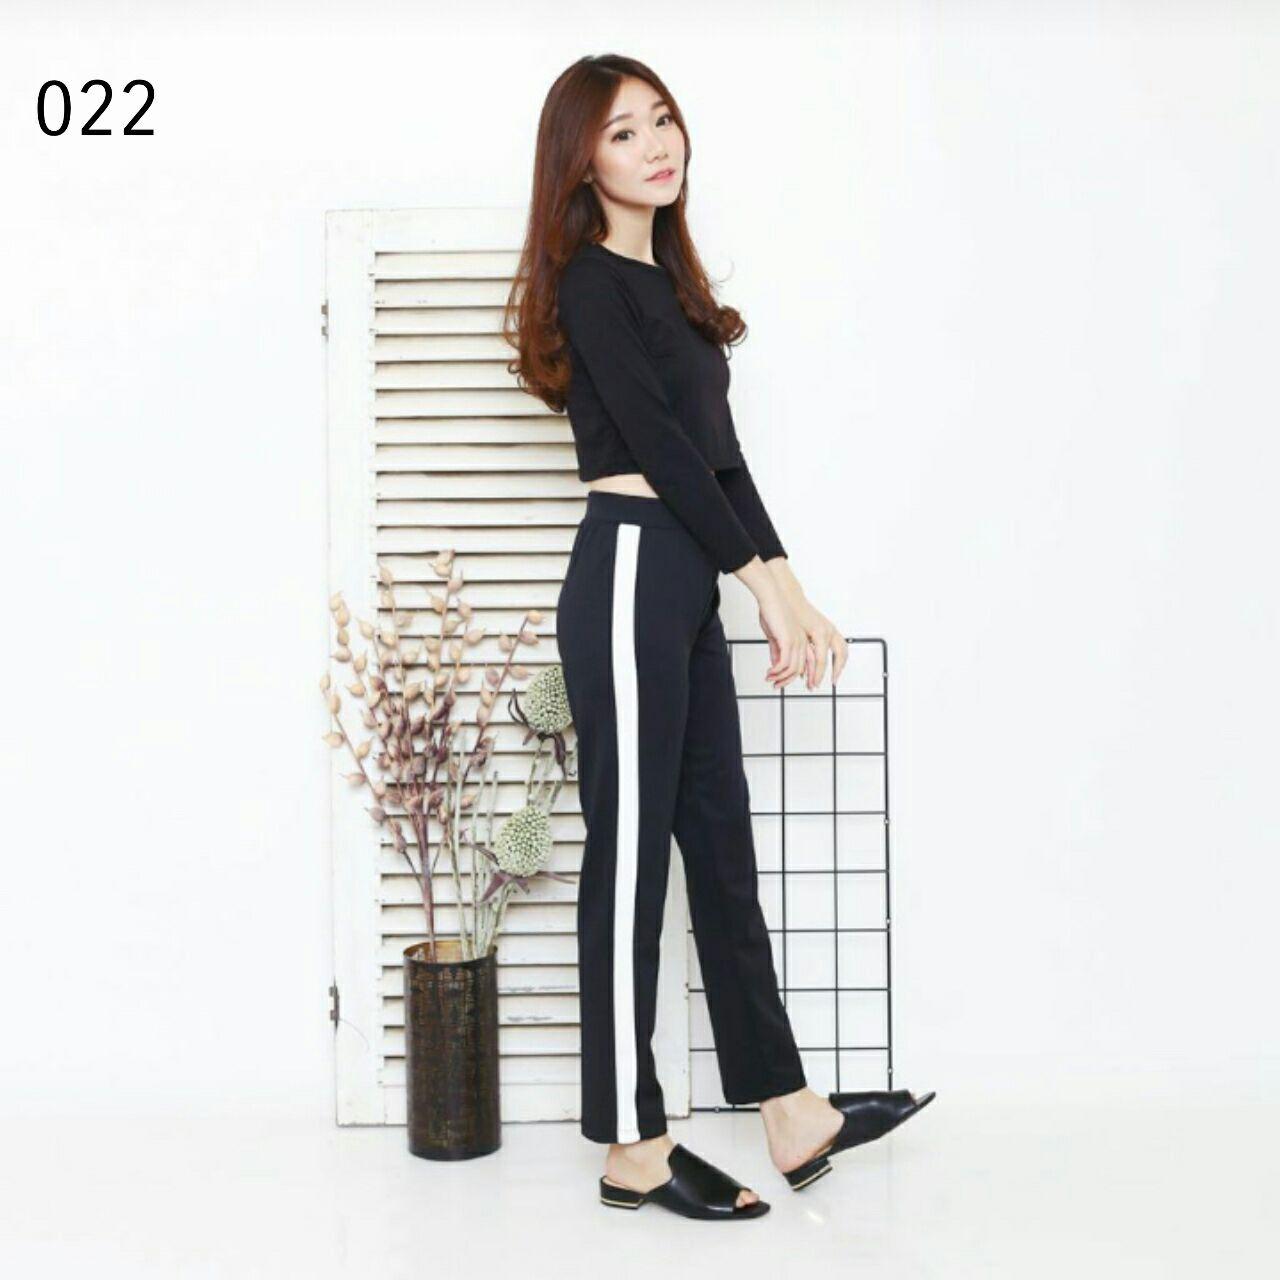 Buy Free Shipping Celana Stripes Pants Panjang Pendek Jeans Double Stripe Soft Blue Error Tolerance Measurements 2 4 Cm